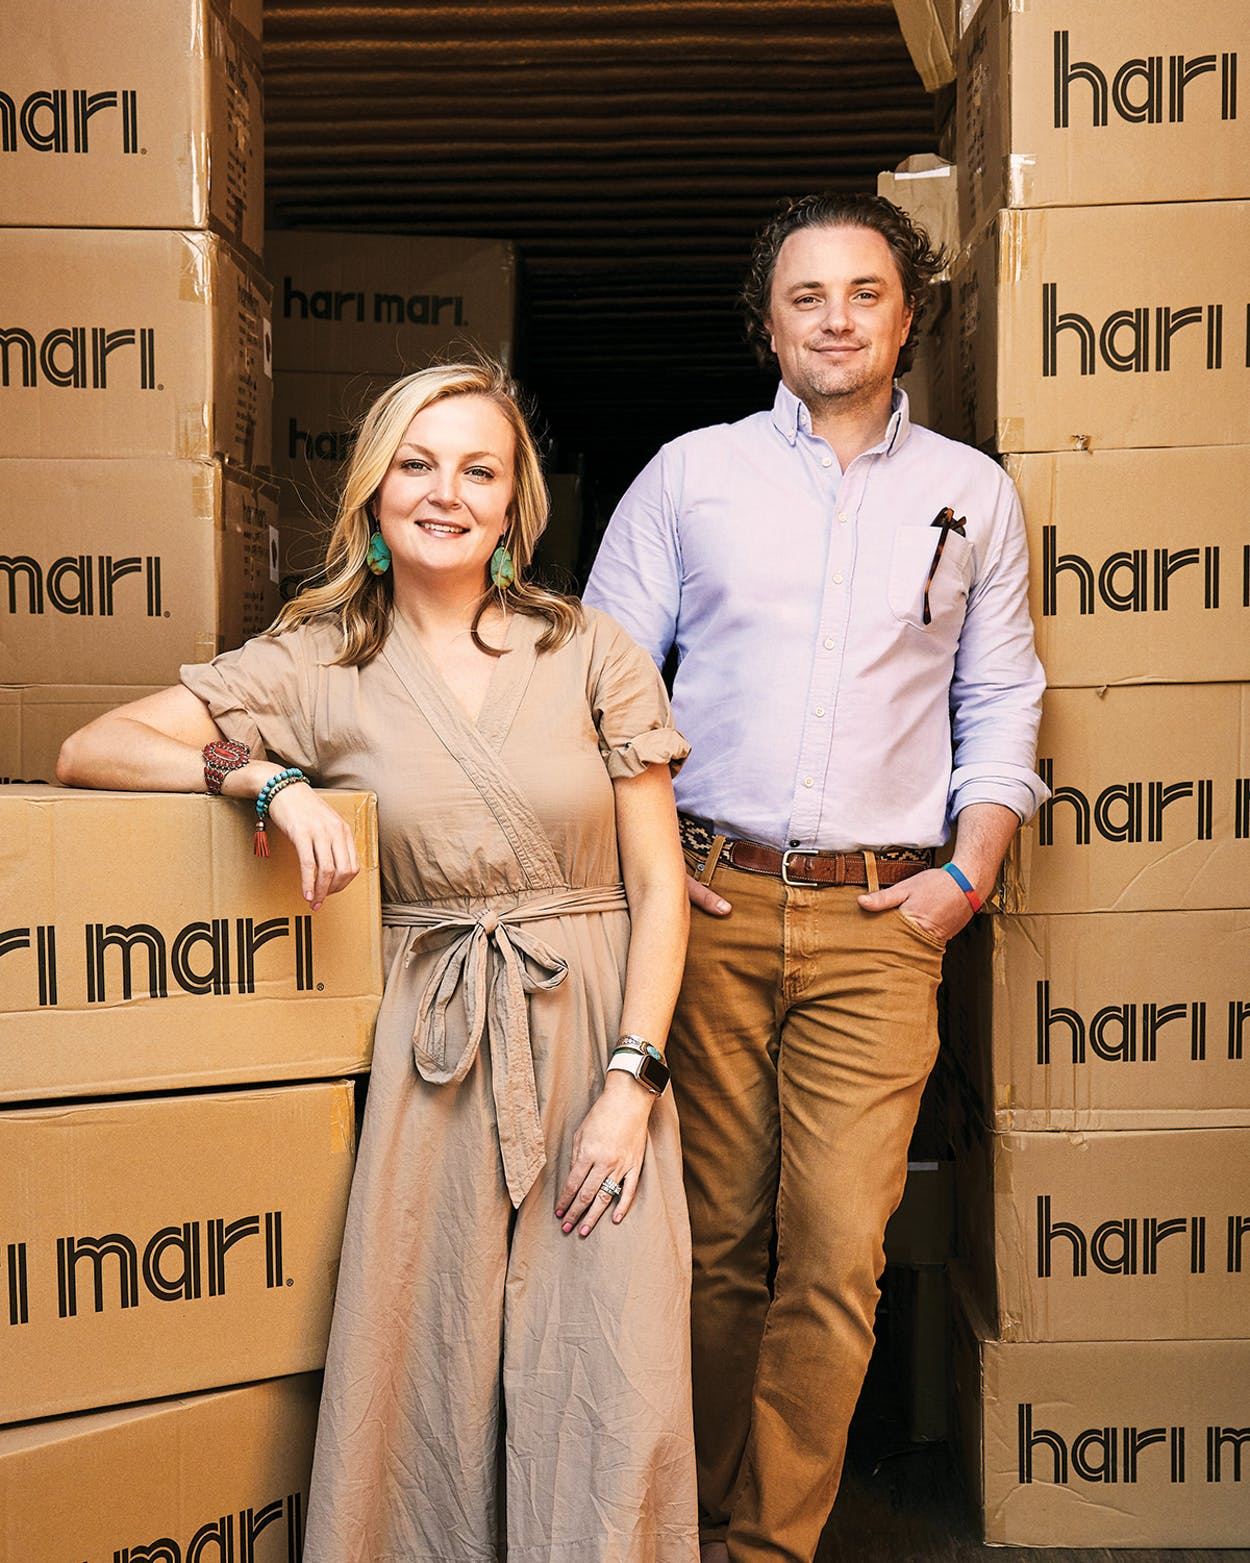 Hari Mari Lila and Jeremy Stewart